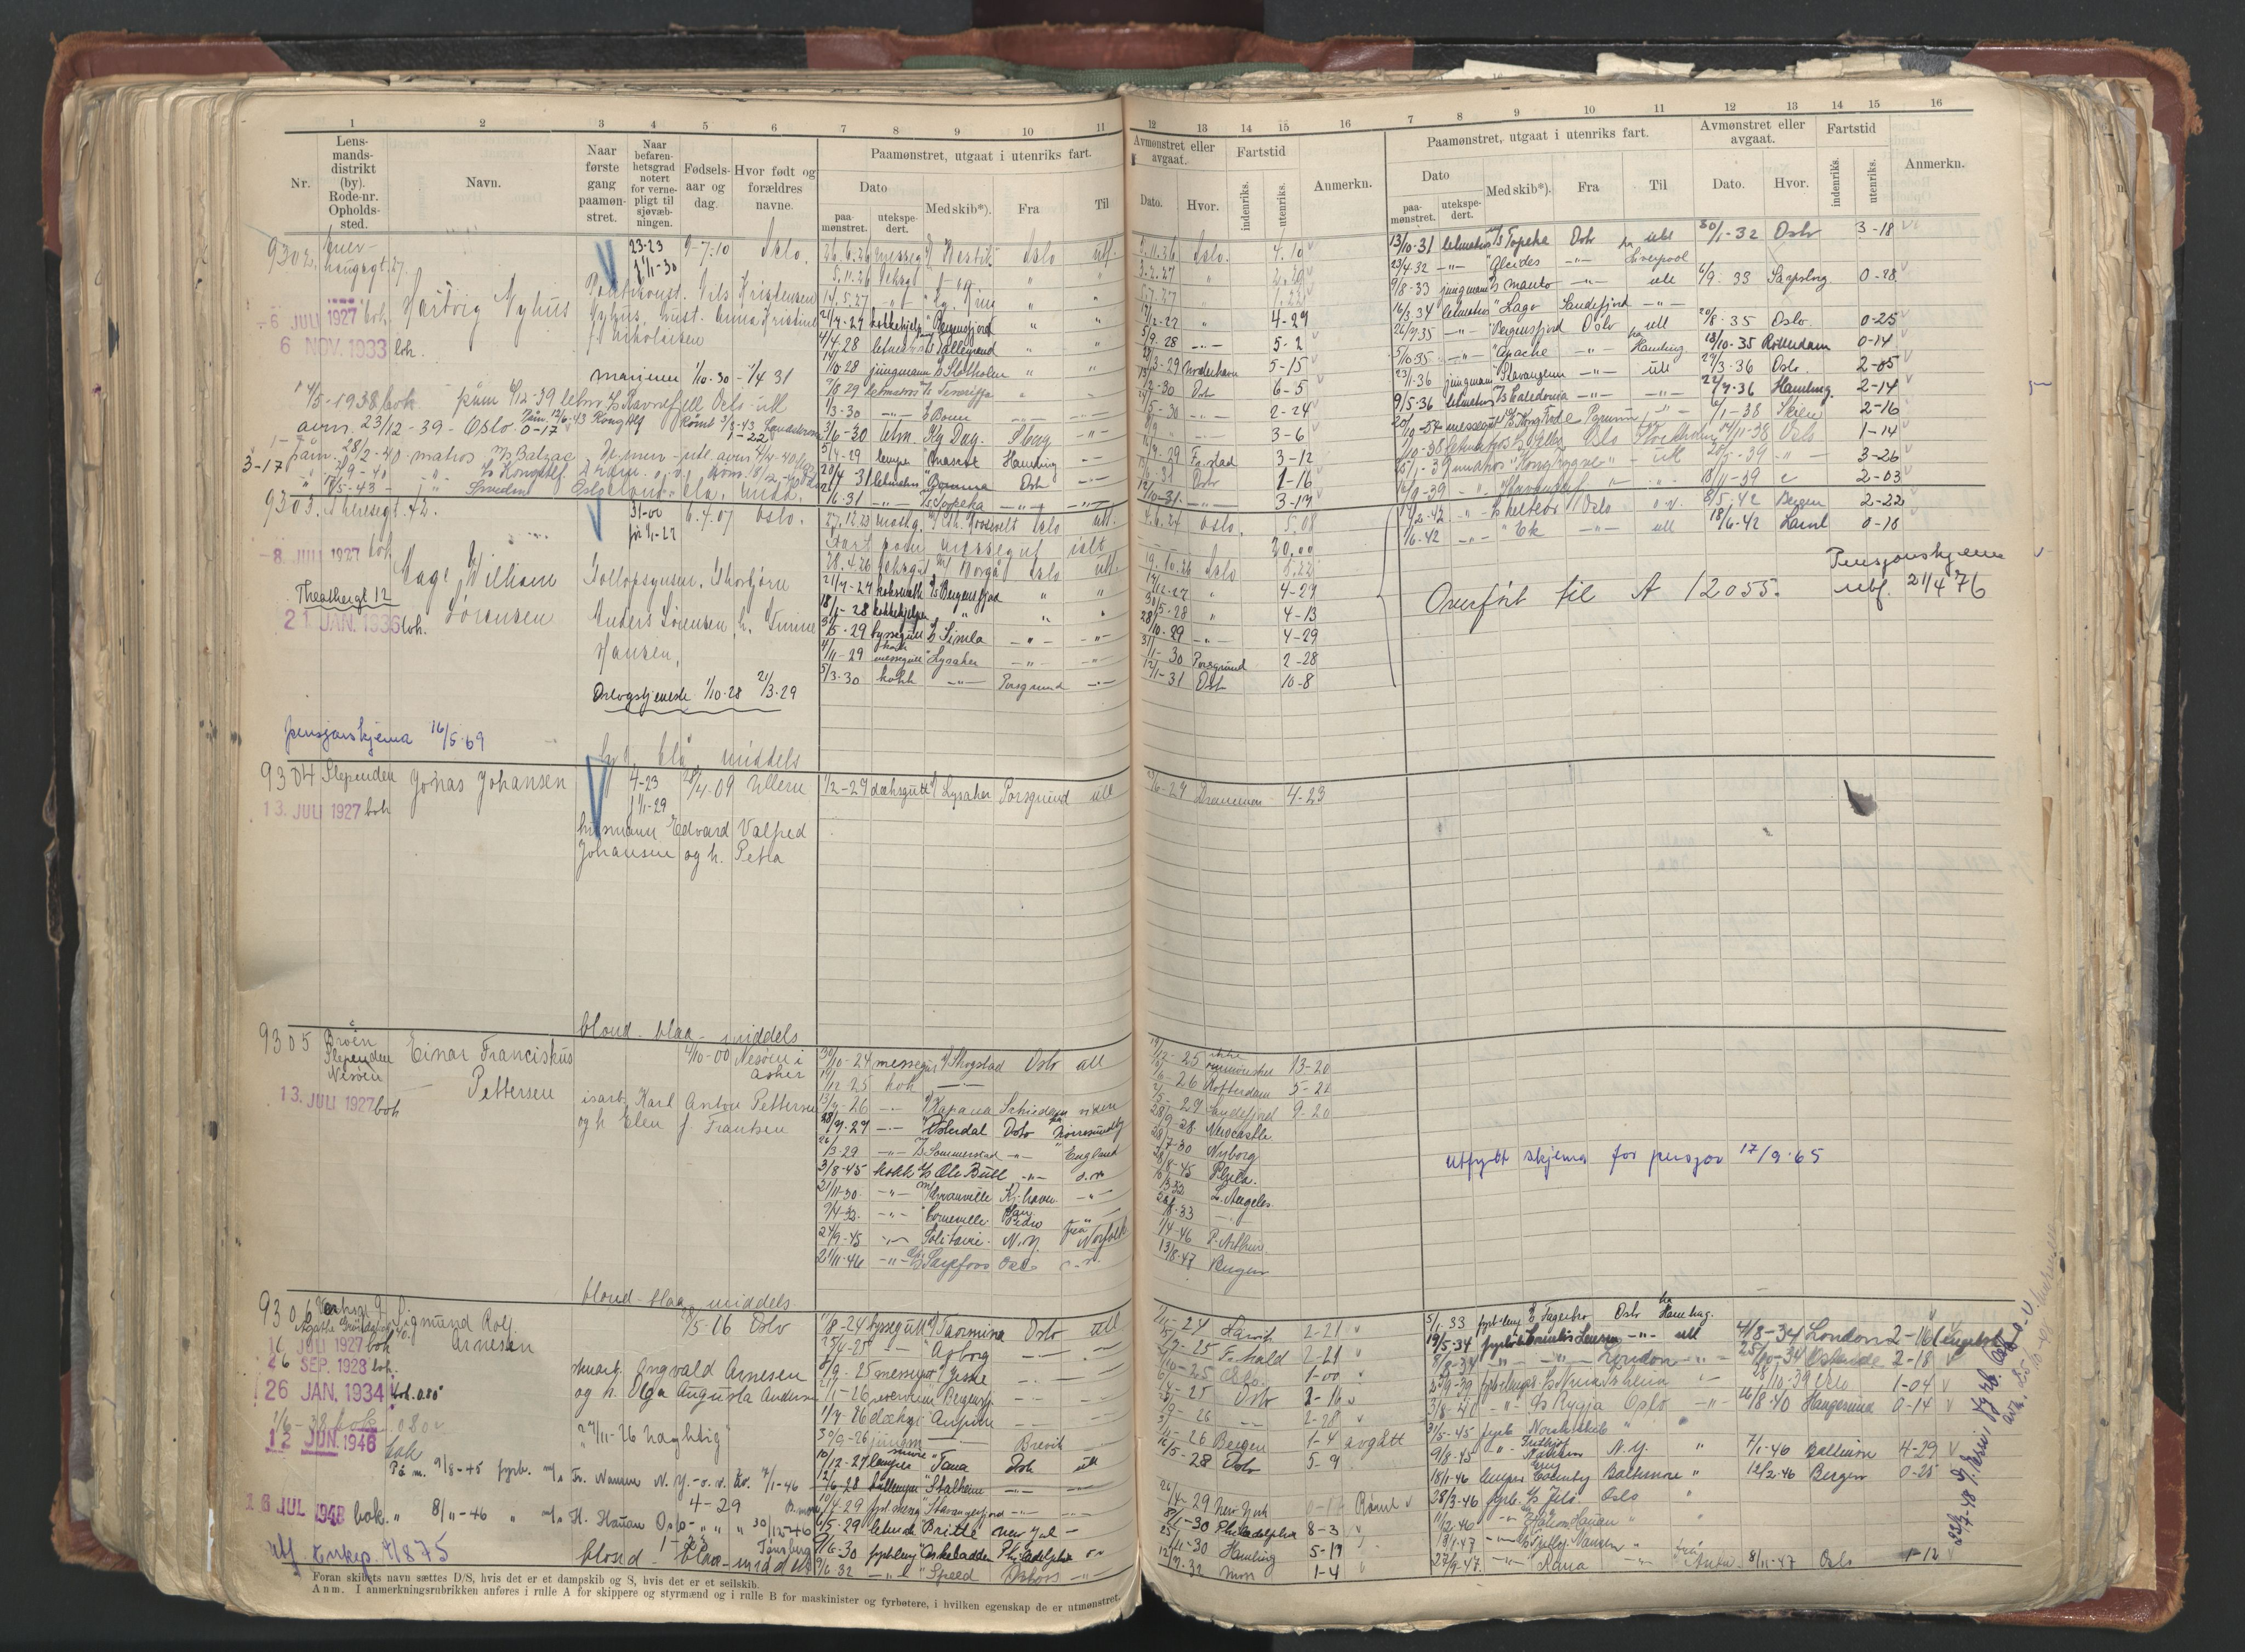 SAO, Oslo sjømannskontor, F/Fc/L0006: Hovedrulle, 1918-1930, s. 354